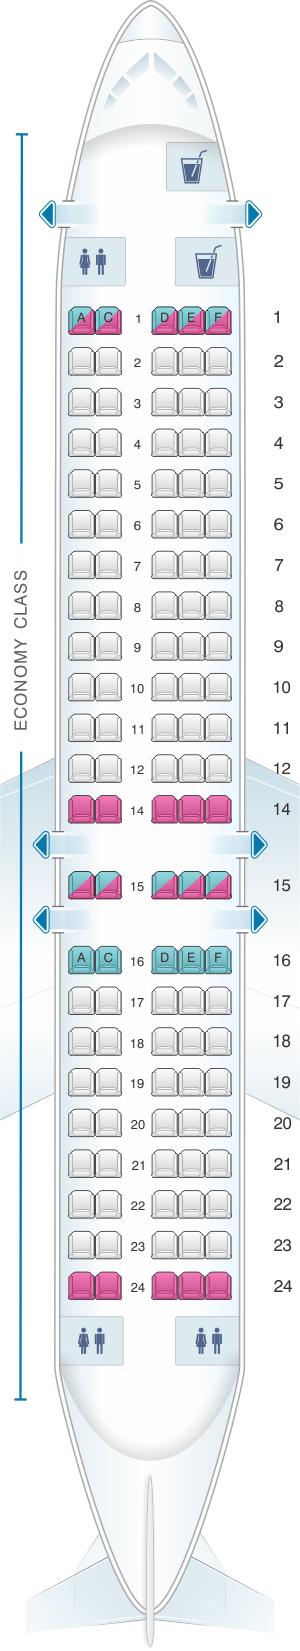 Plan De Cabine Blue1 Boeing B717 200 Seatmaestro Fr